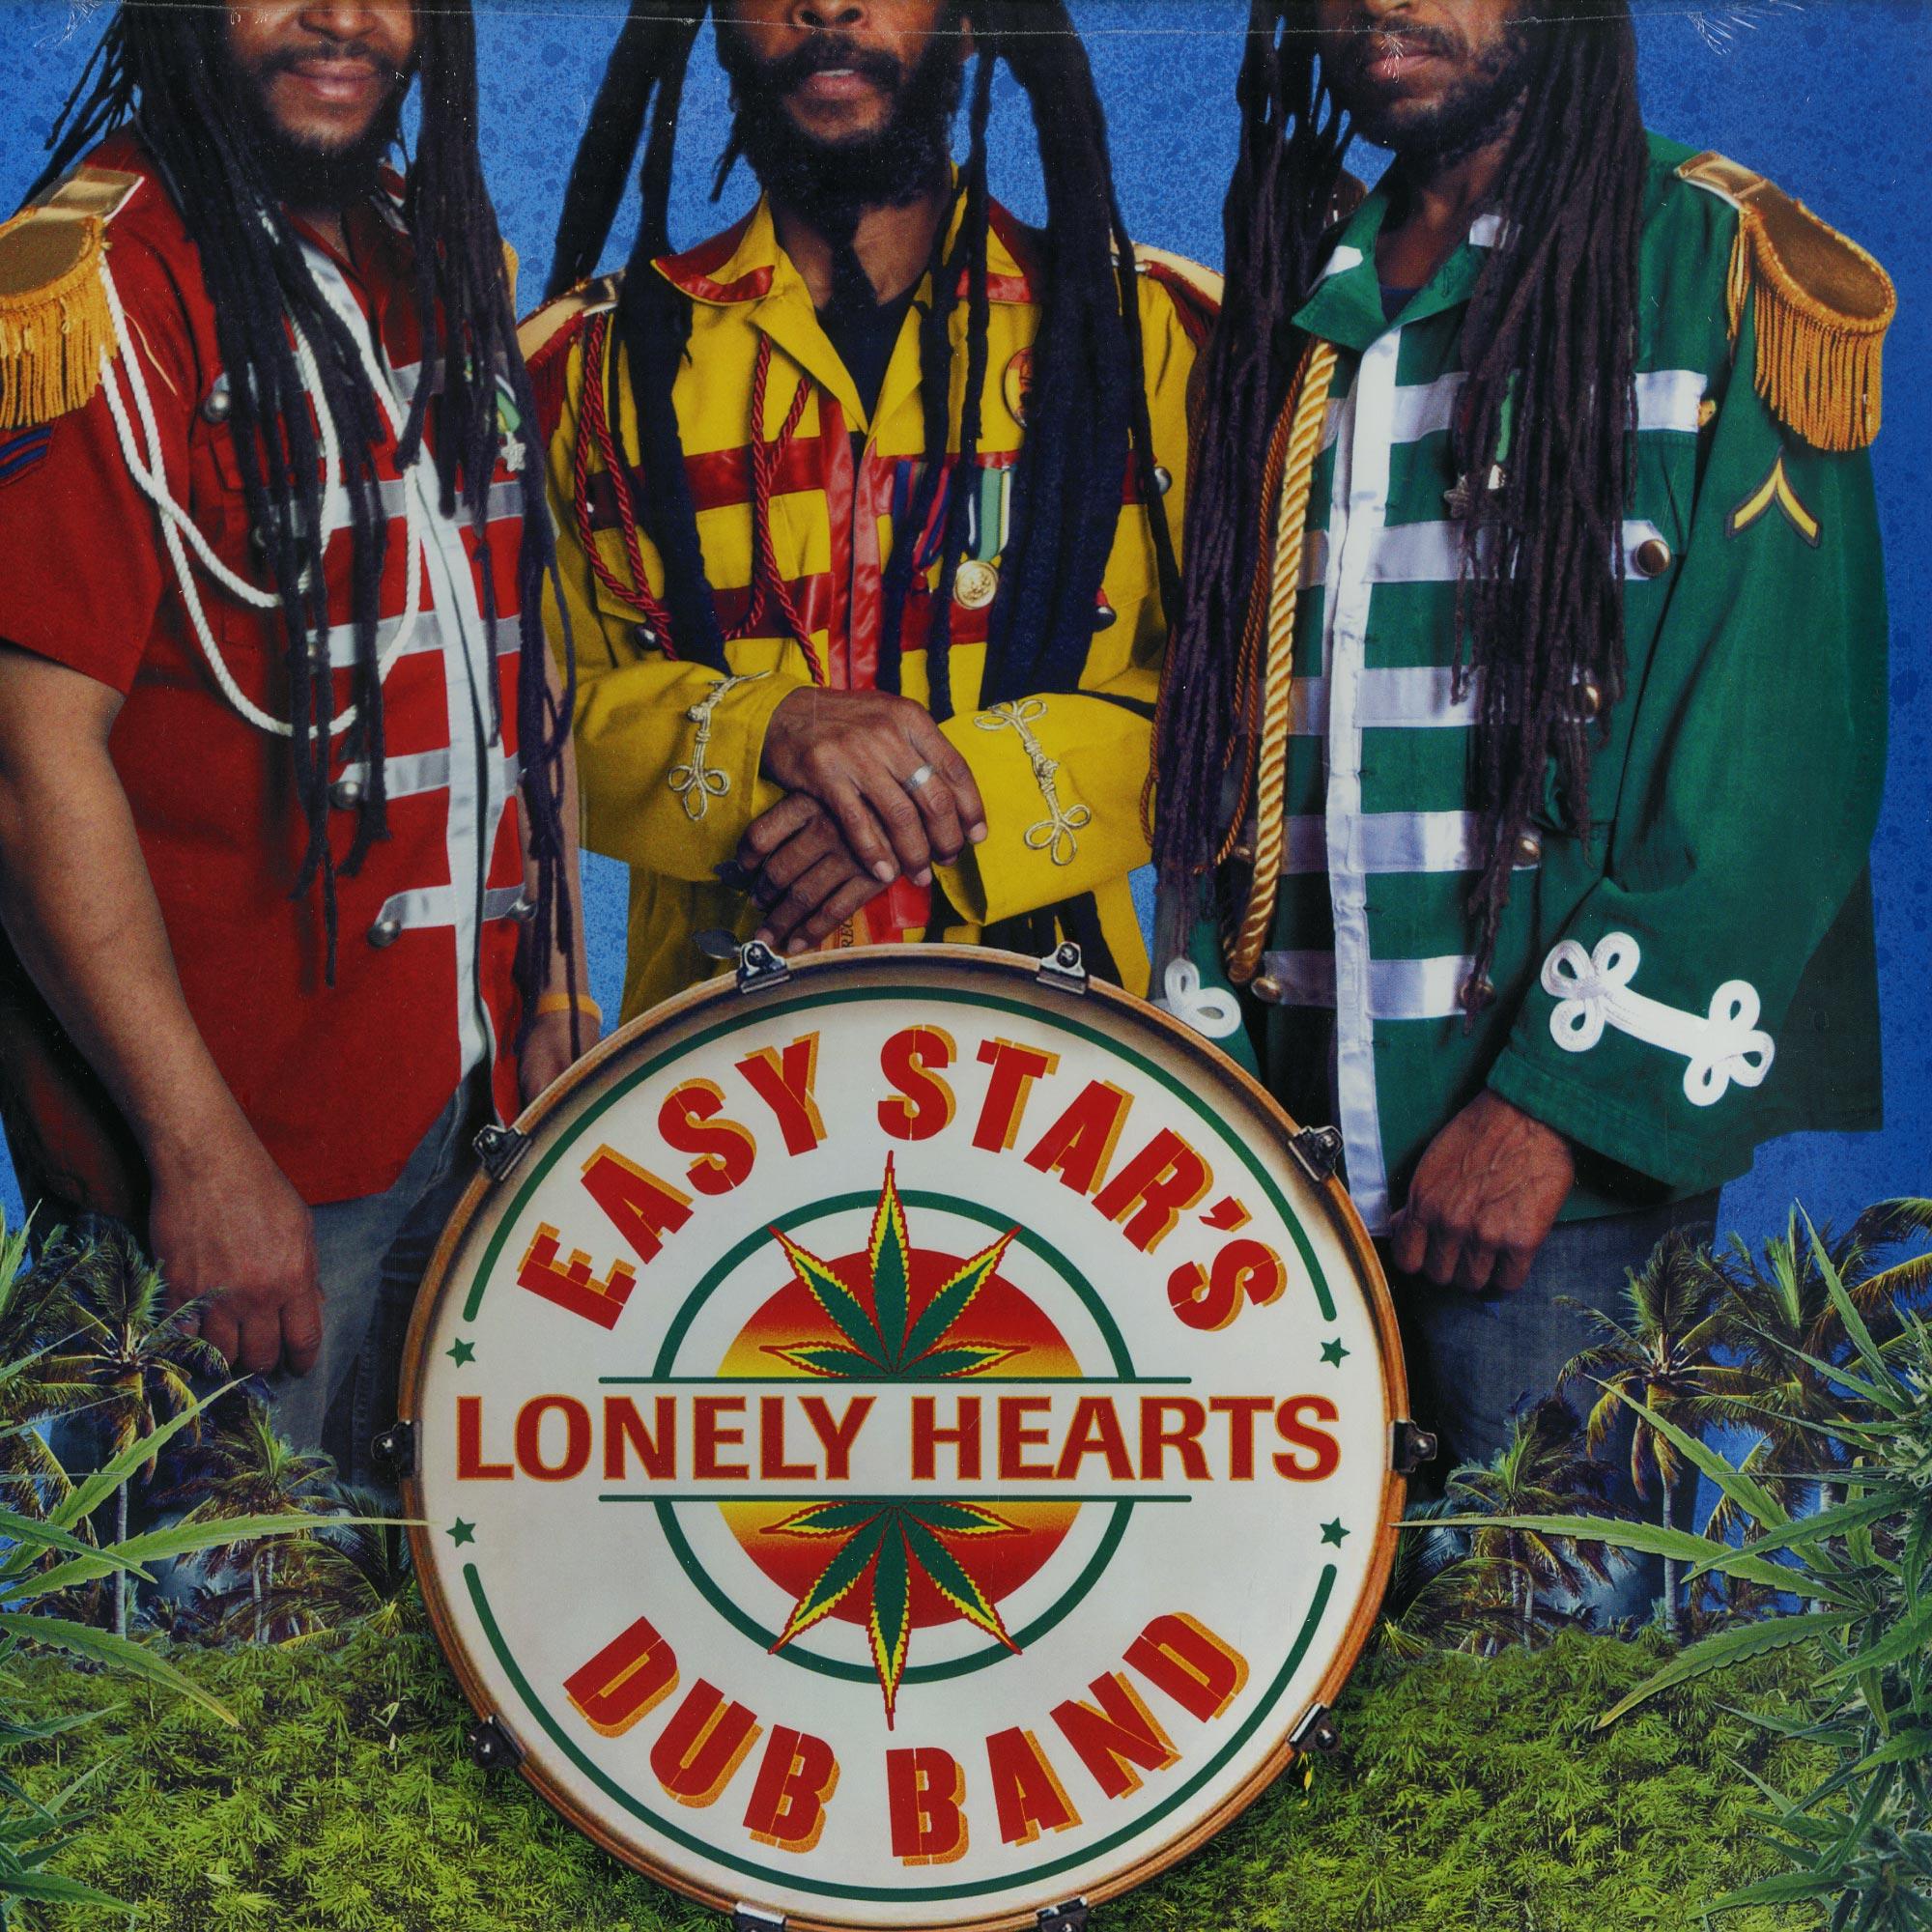 Easy Star All-Stars - EASY STARS LONELY HEARTS DUB